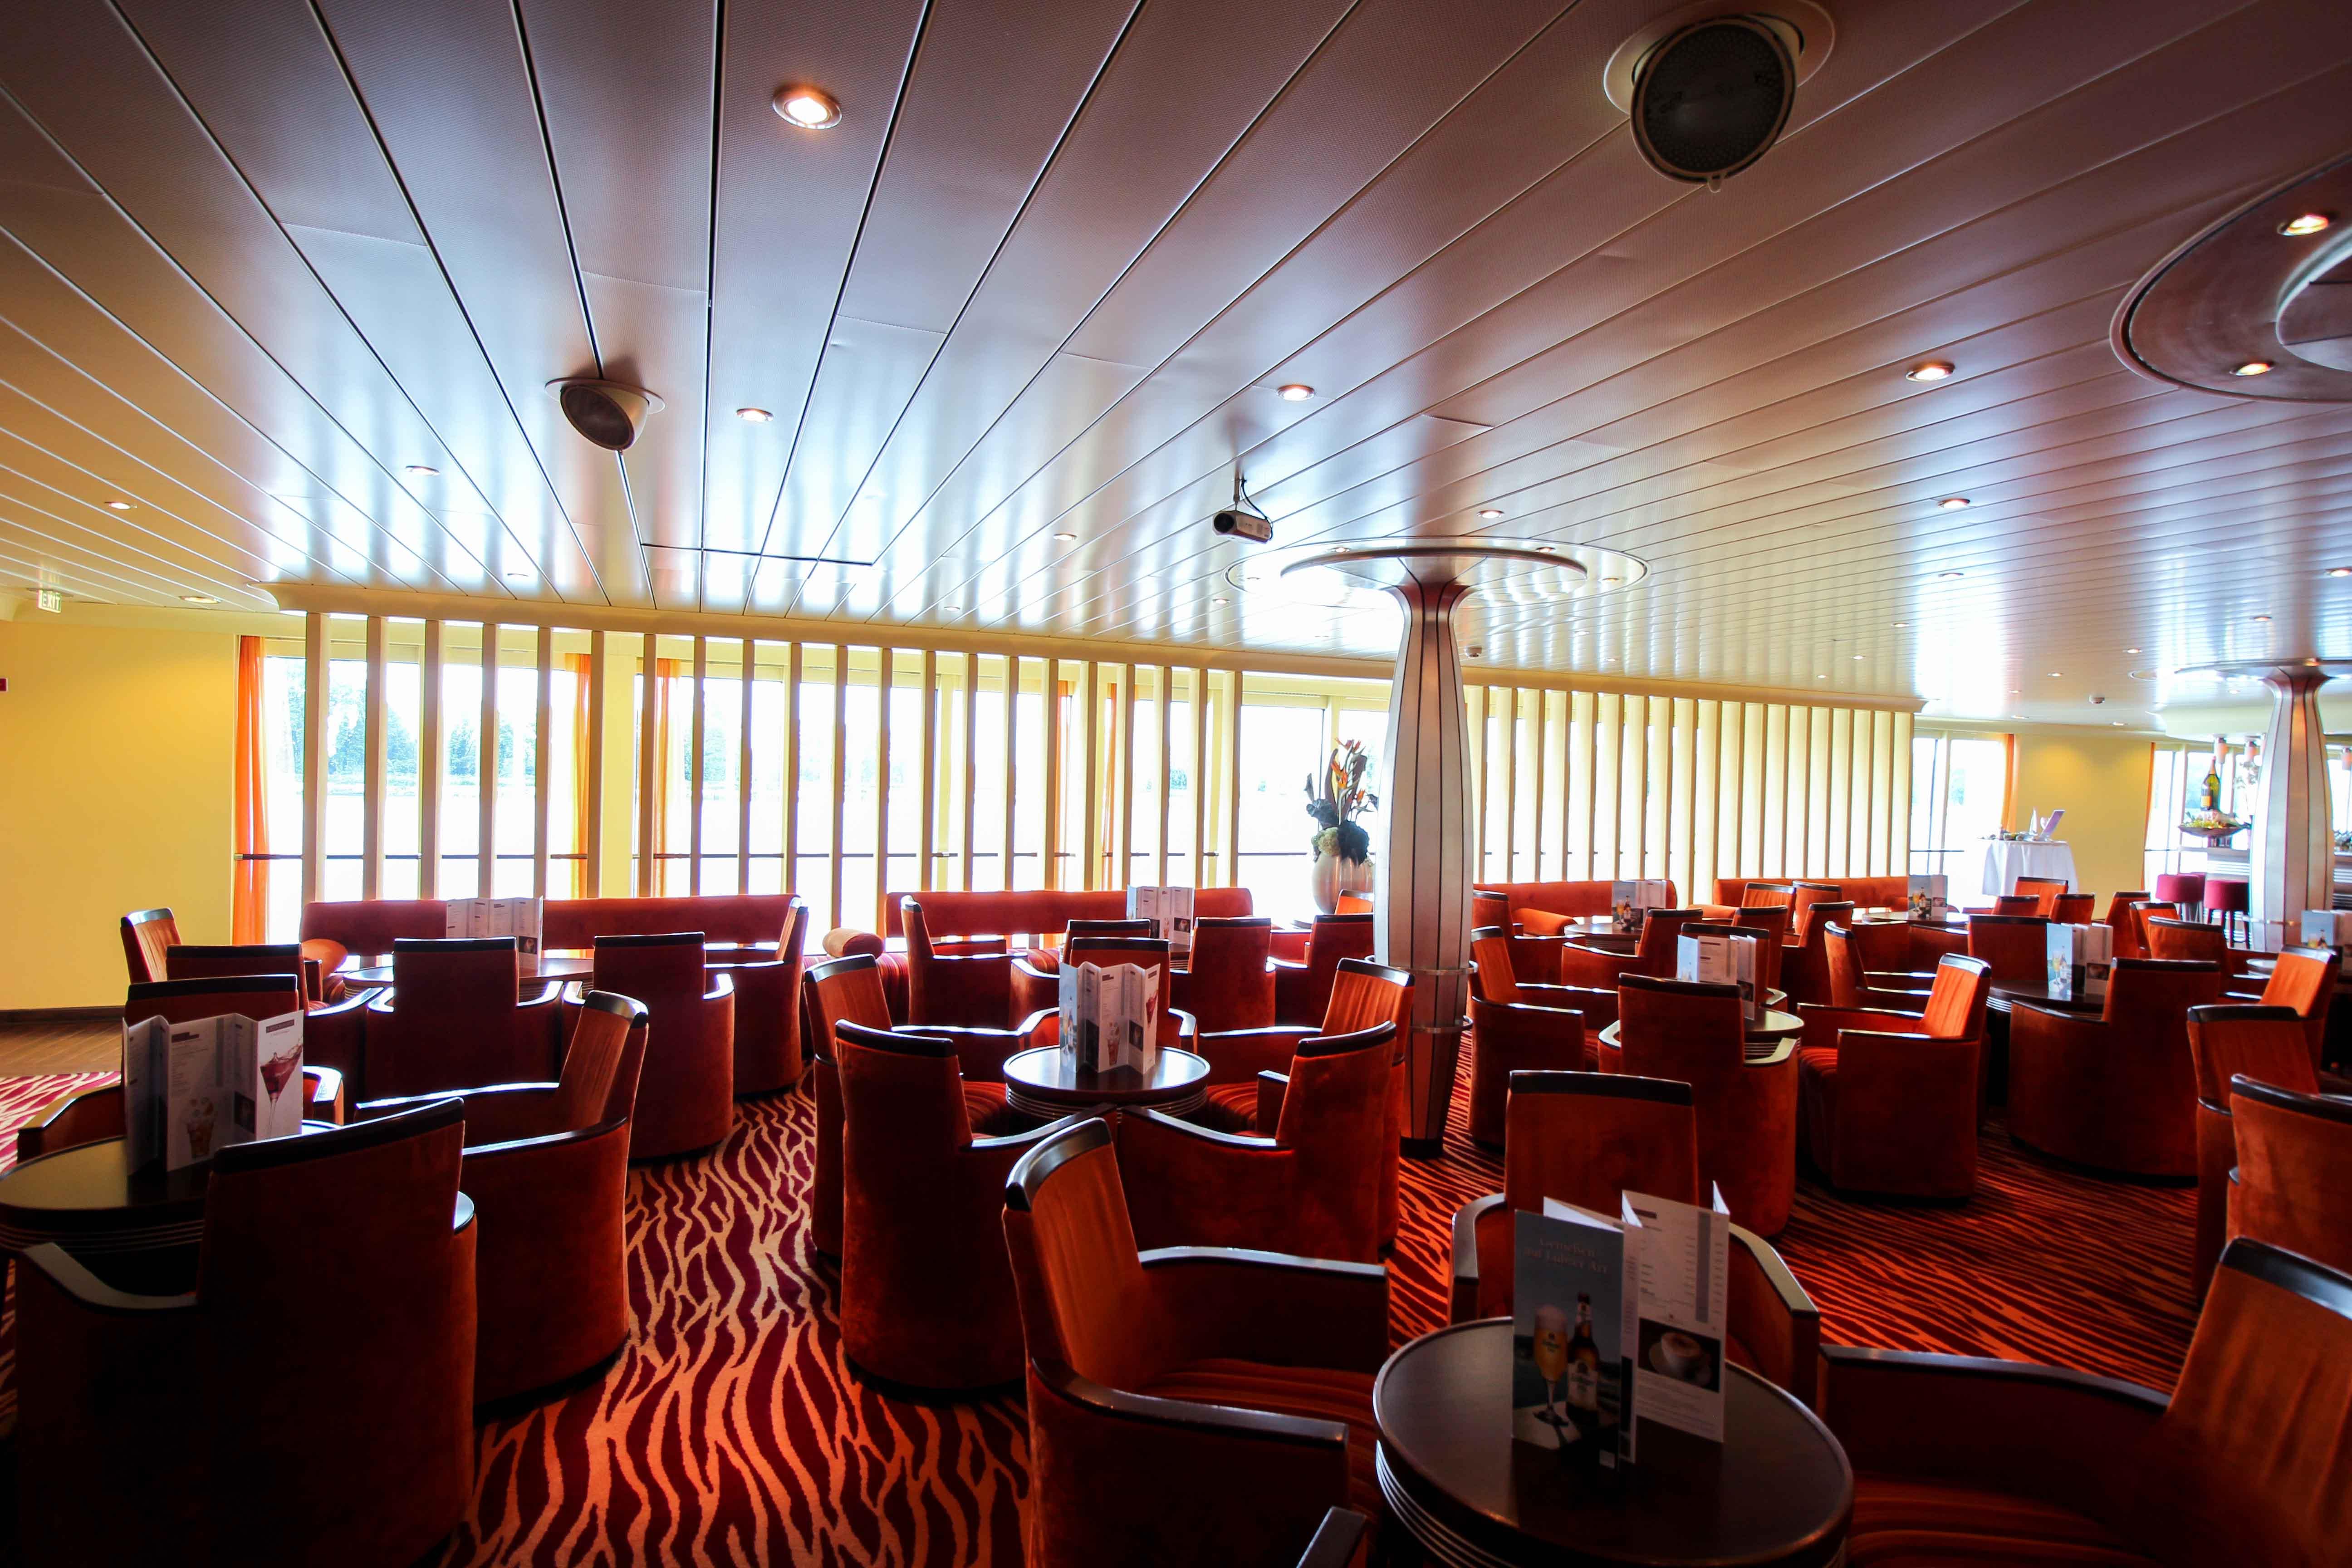 AROSA VIVA Kreuzfahrtschiff Lounge Bar Seine Flusskreuzfahrt